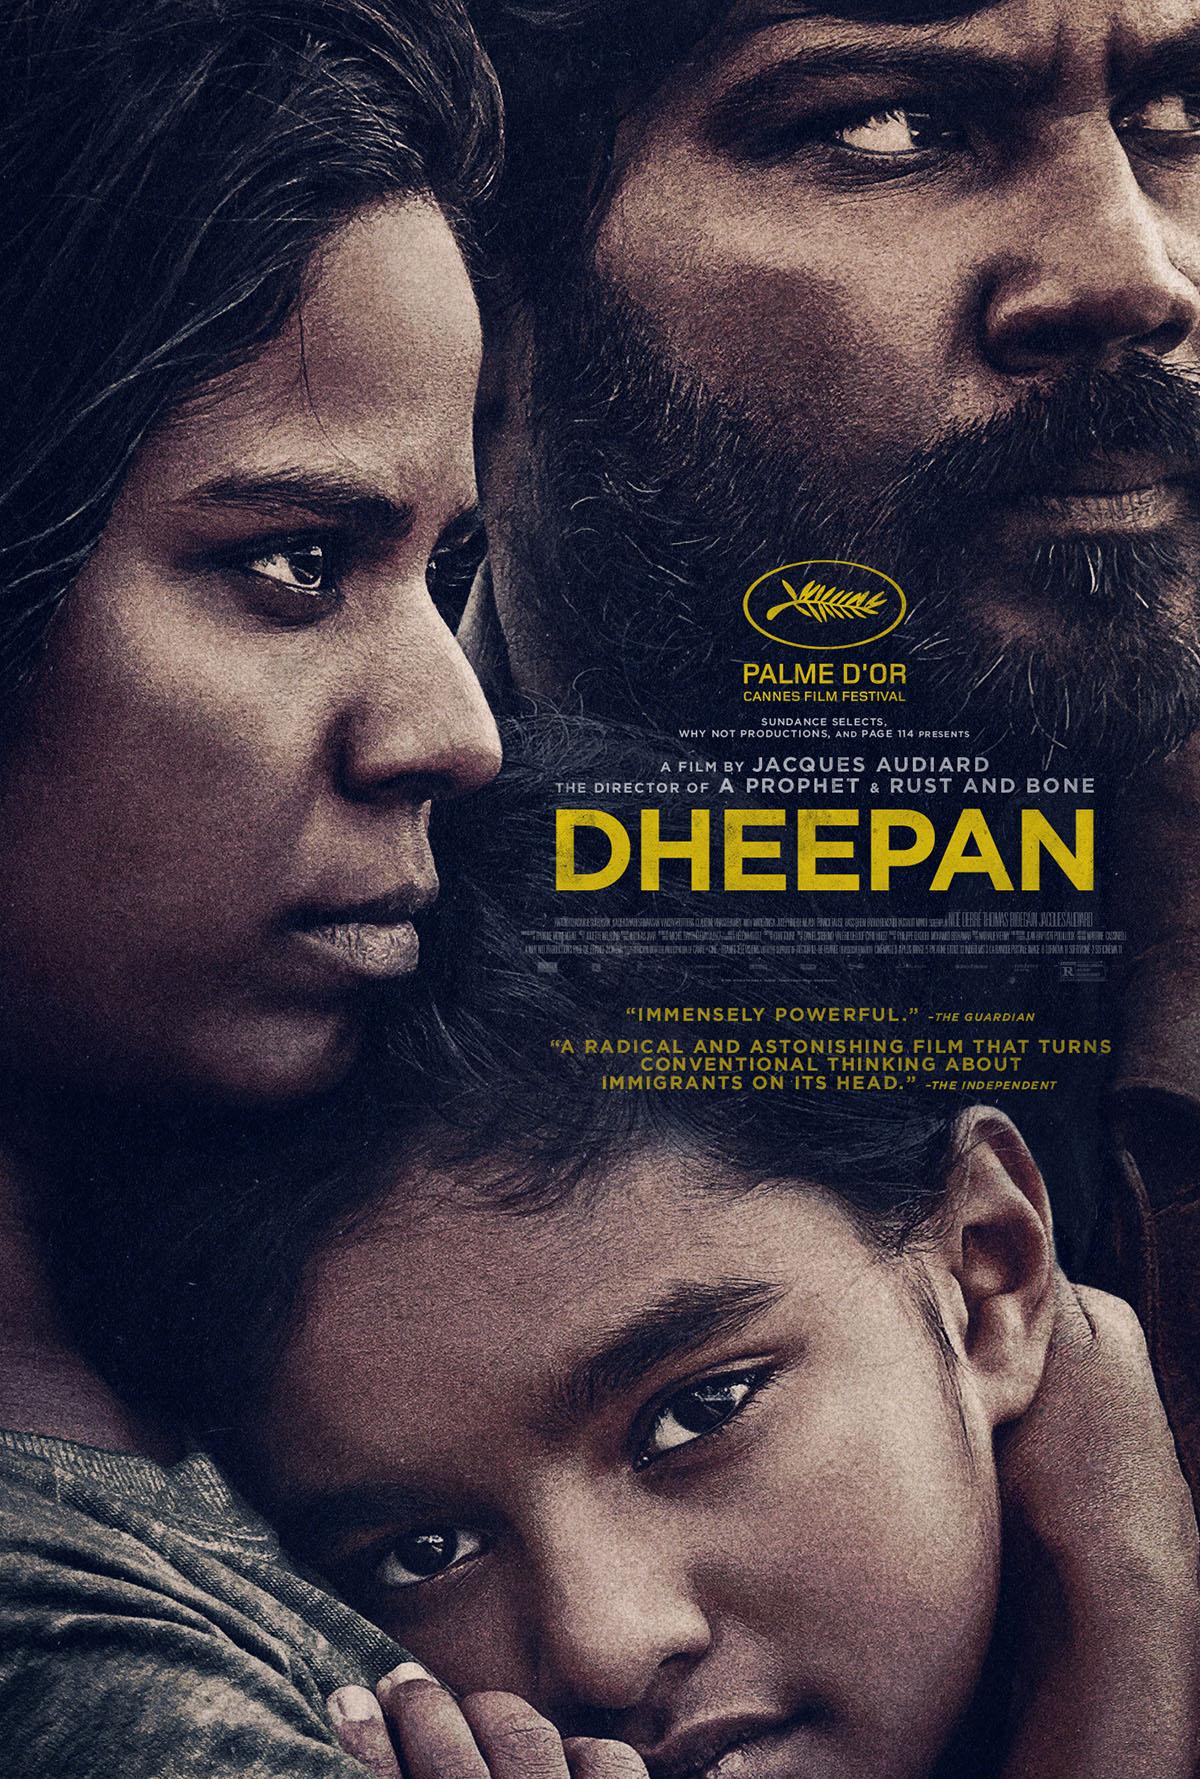 Dheepan (2015) BluRay 480p, 720p & 1080p